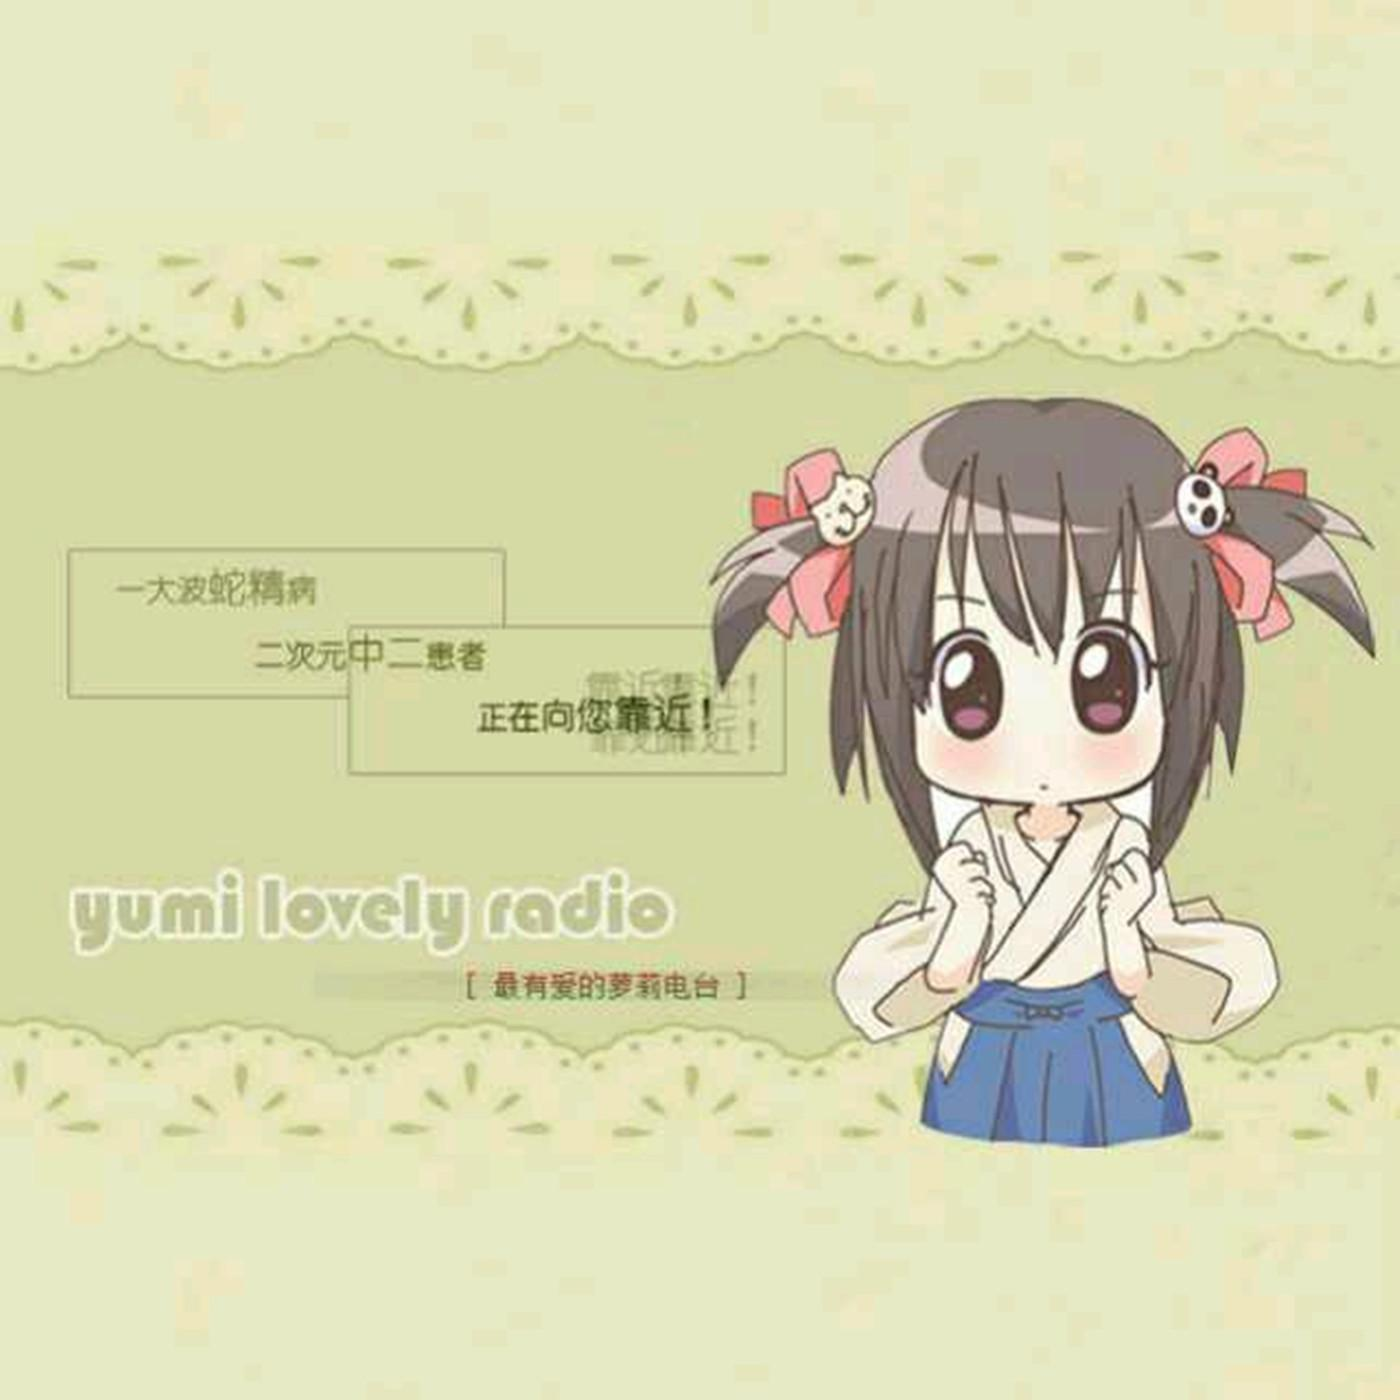 <![CDATA[yumi lovely radio]]>